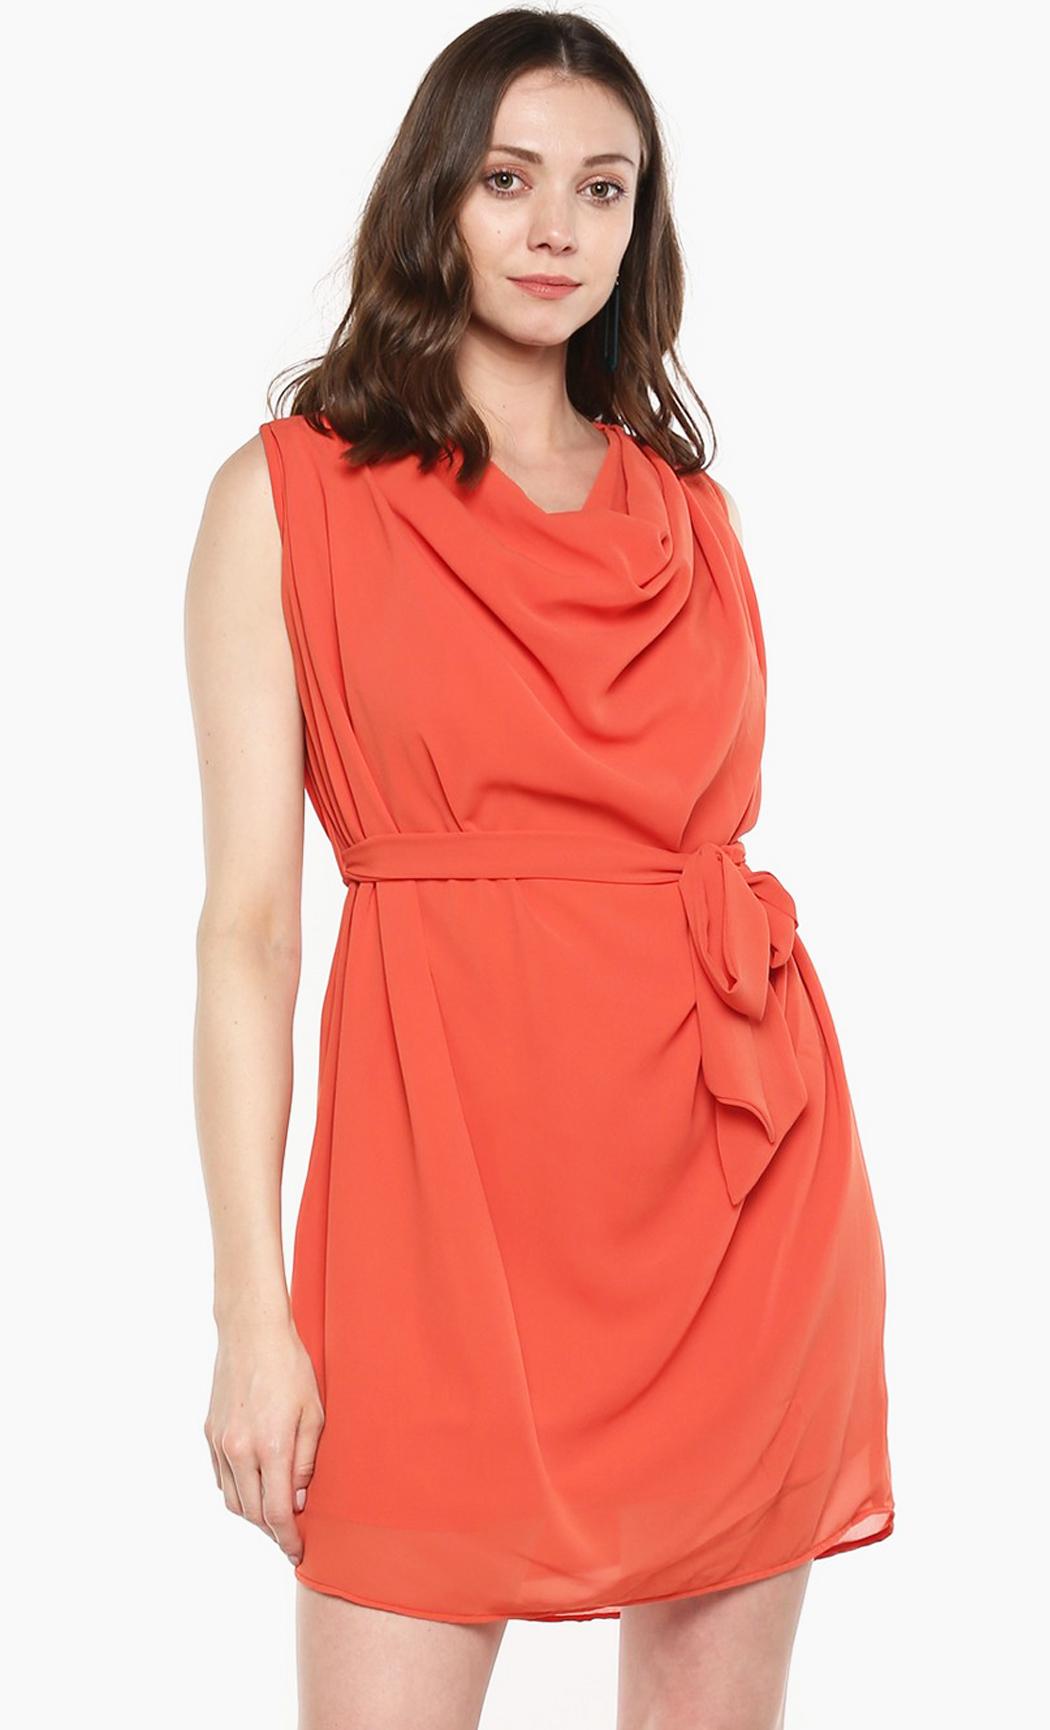 Coral Donut Sprinkles Drape Style Dress. Buy Online